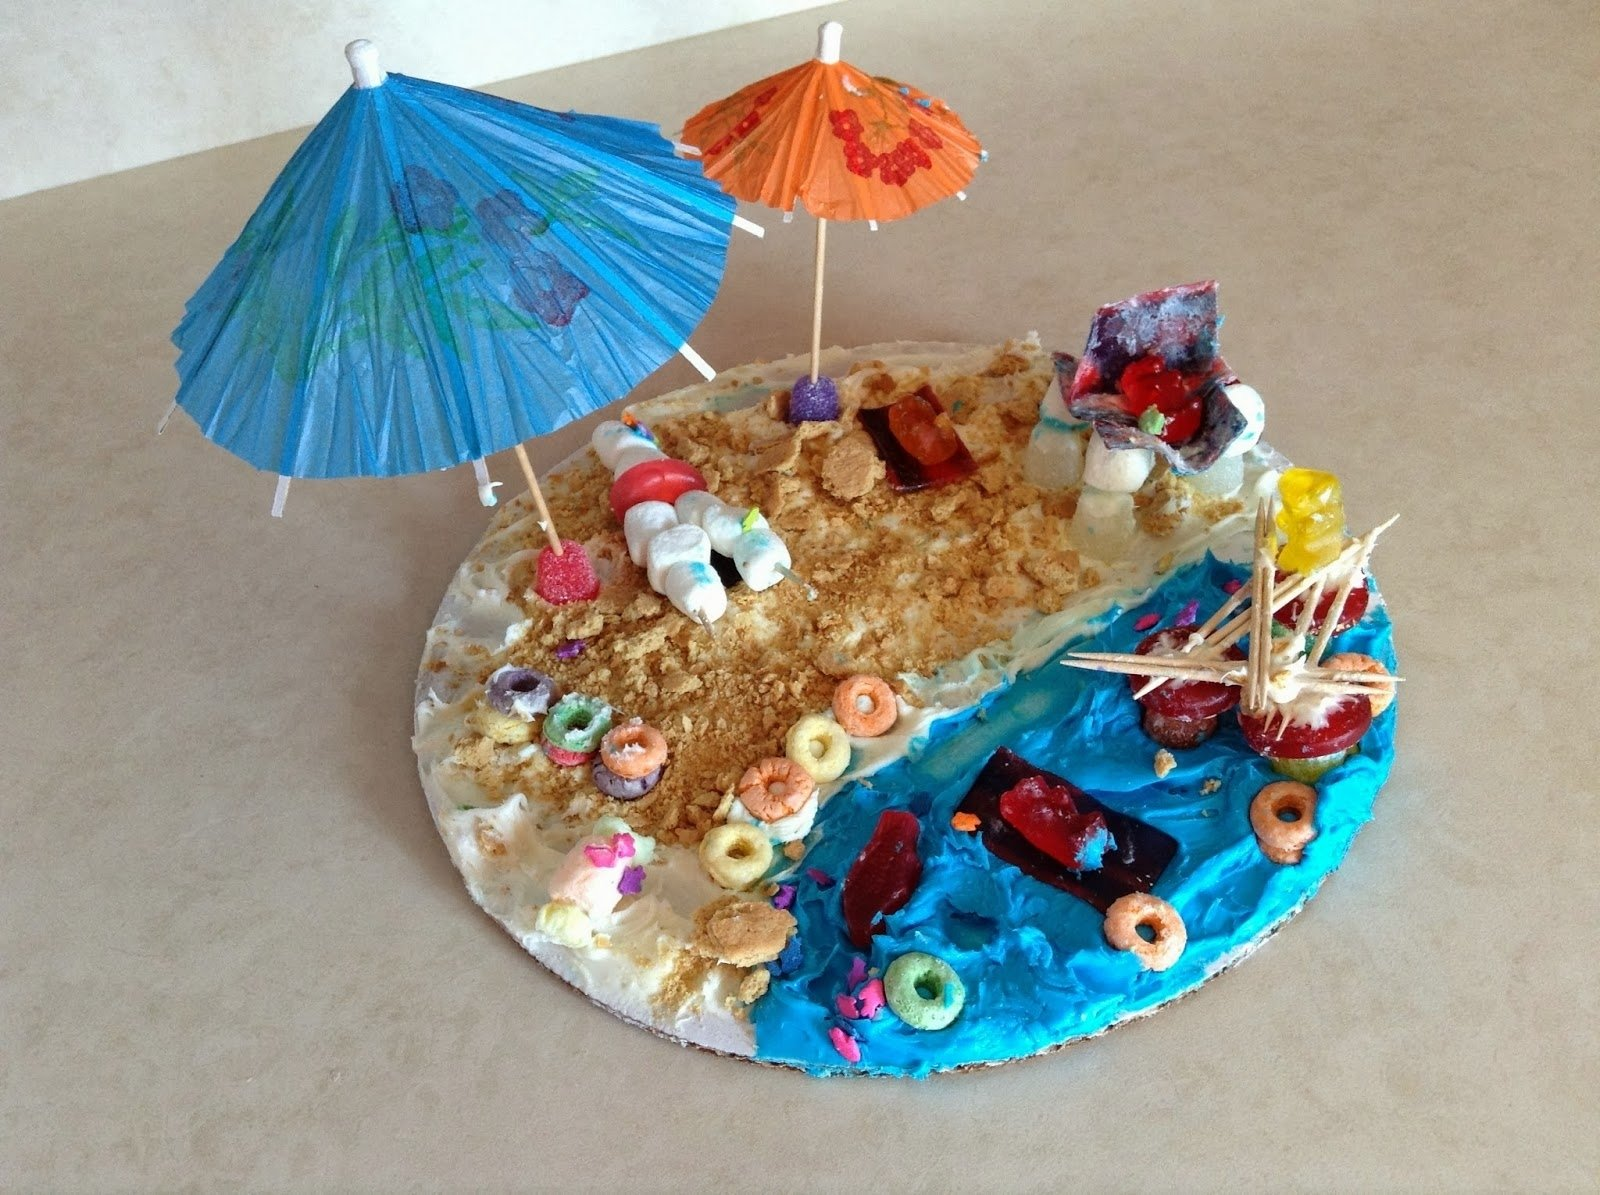 10 Elegant Summer Arts And Crafts Ideas summer arts and crafts ideas ye craft ideas 2021